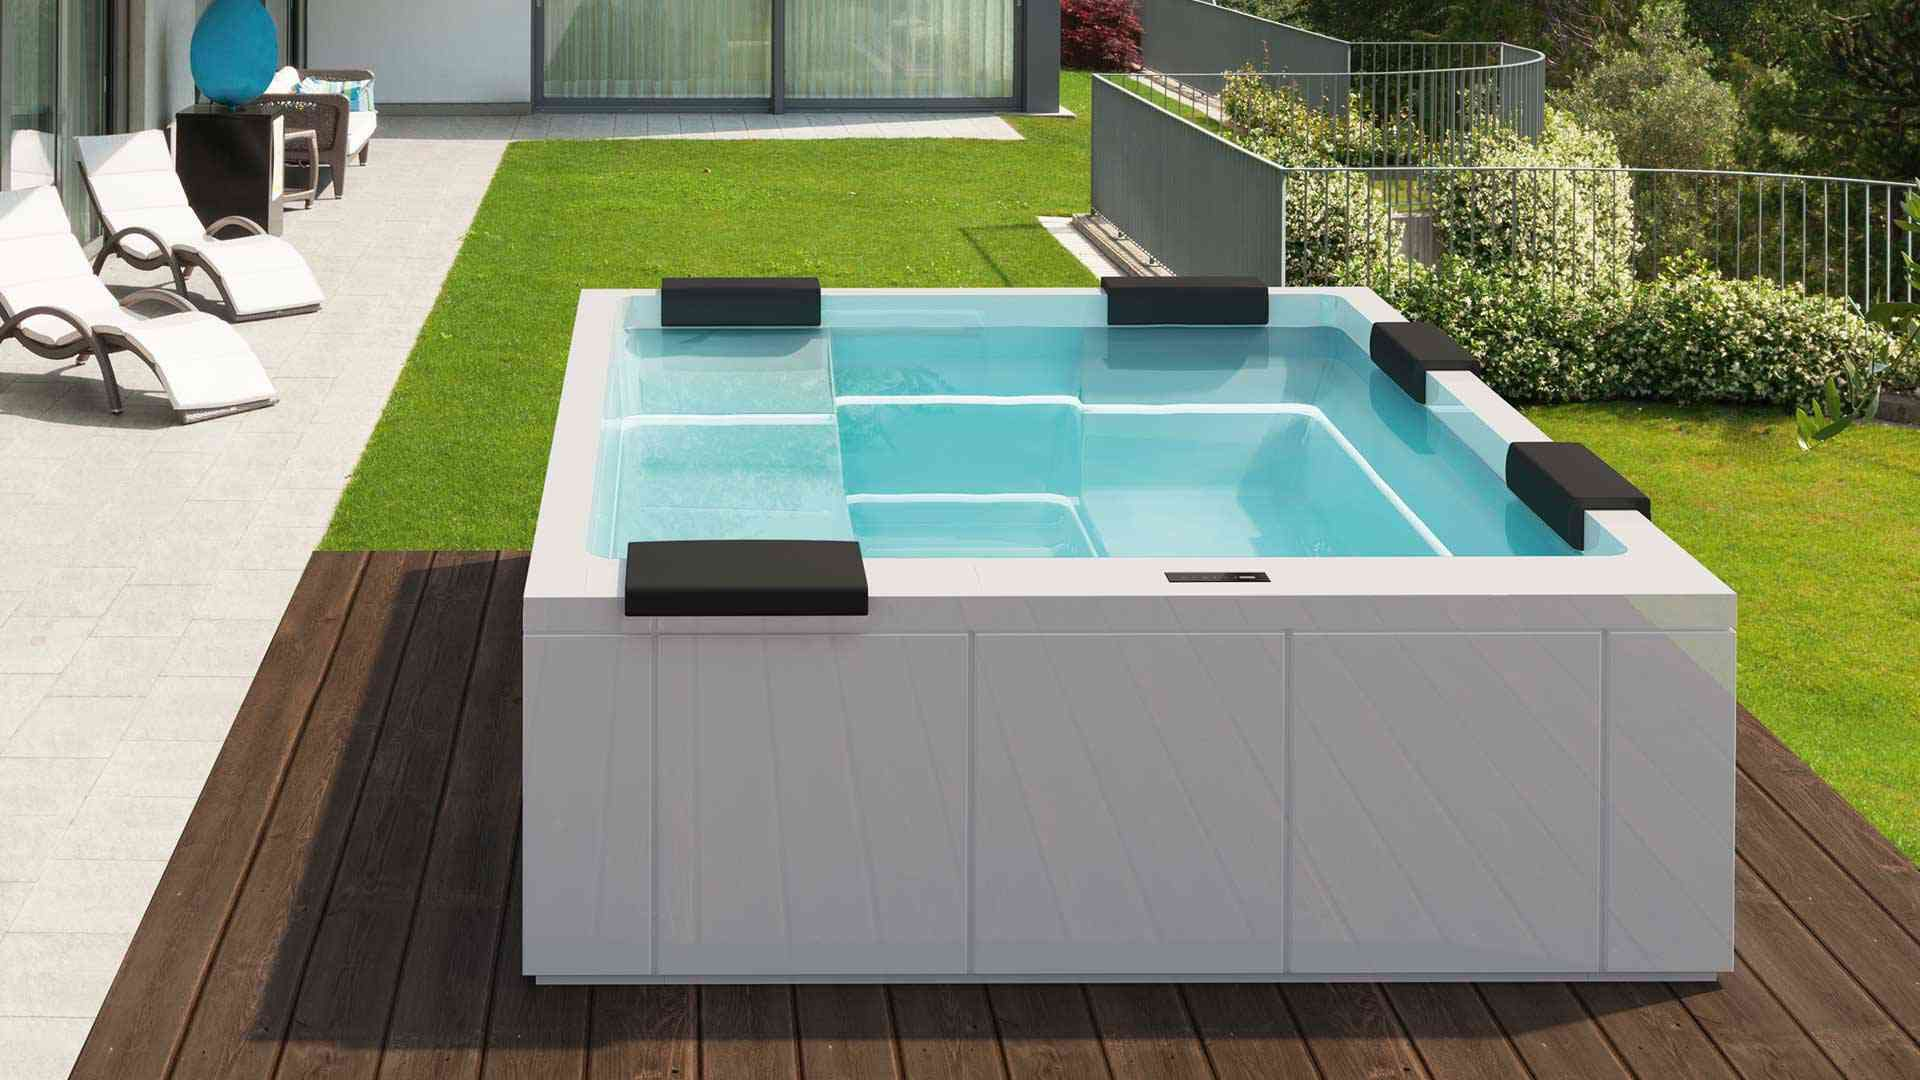 Luxus Pool Whirlpool Maya Spanatural In 2020 Wirlpool Outdoor Whirlpool Pool